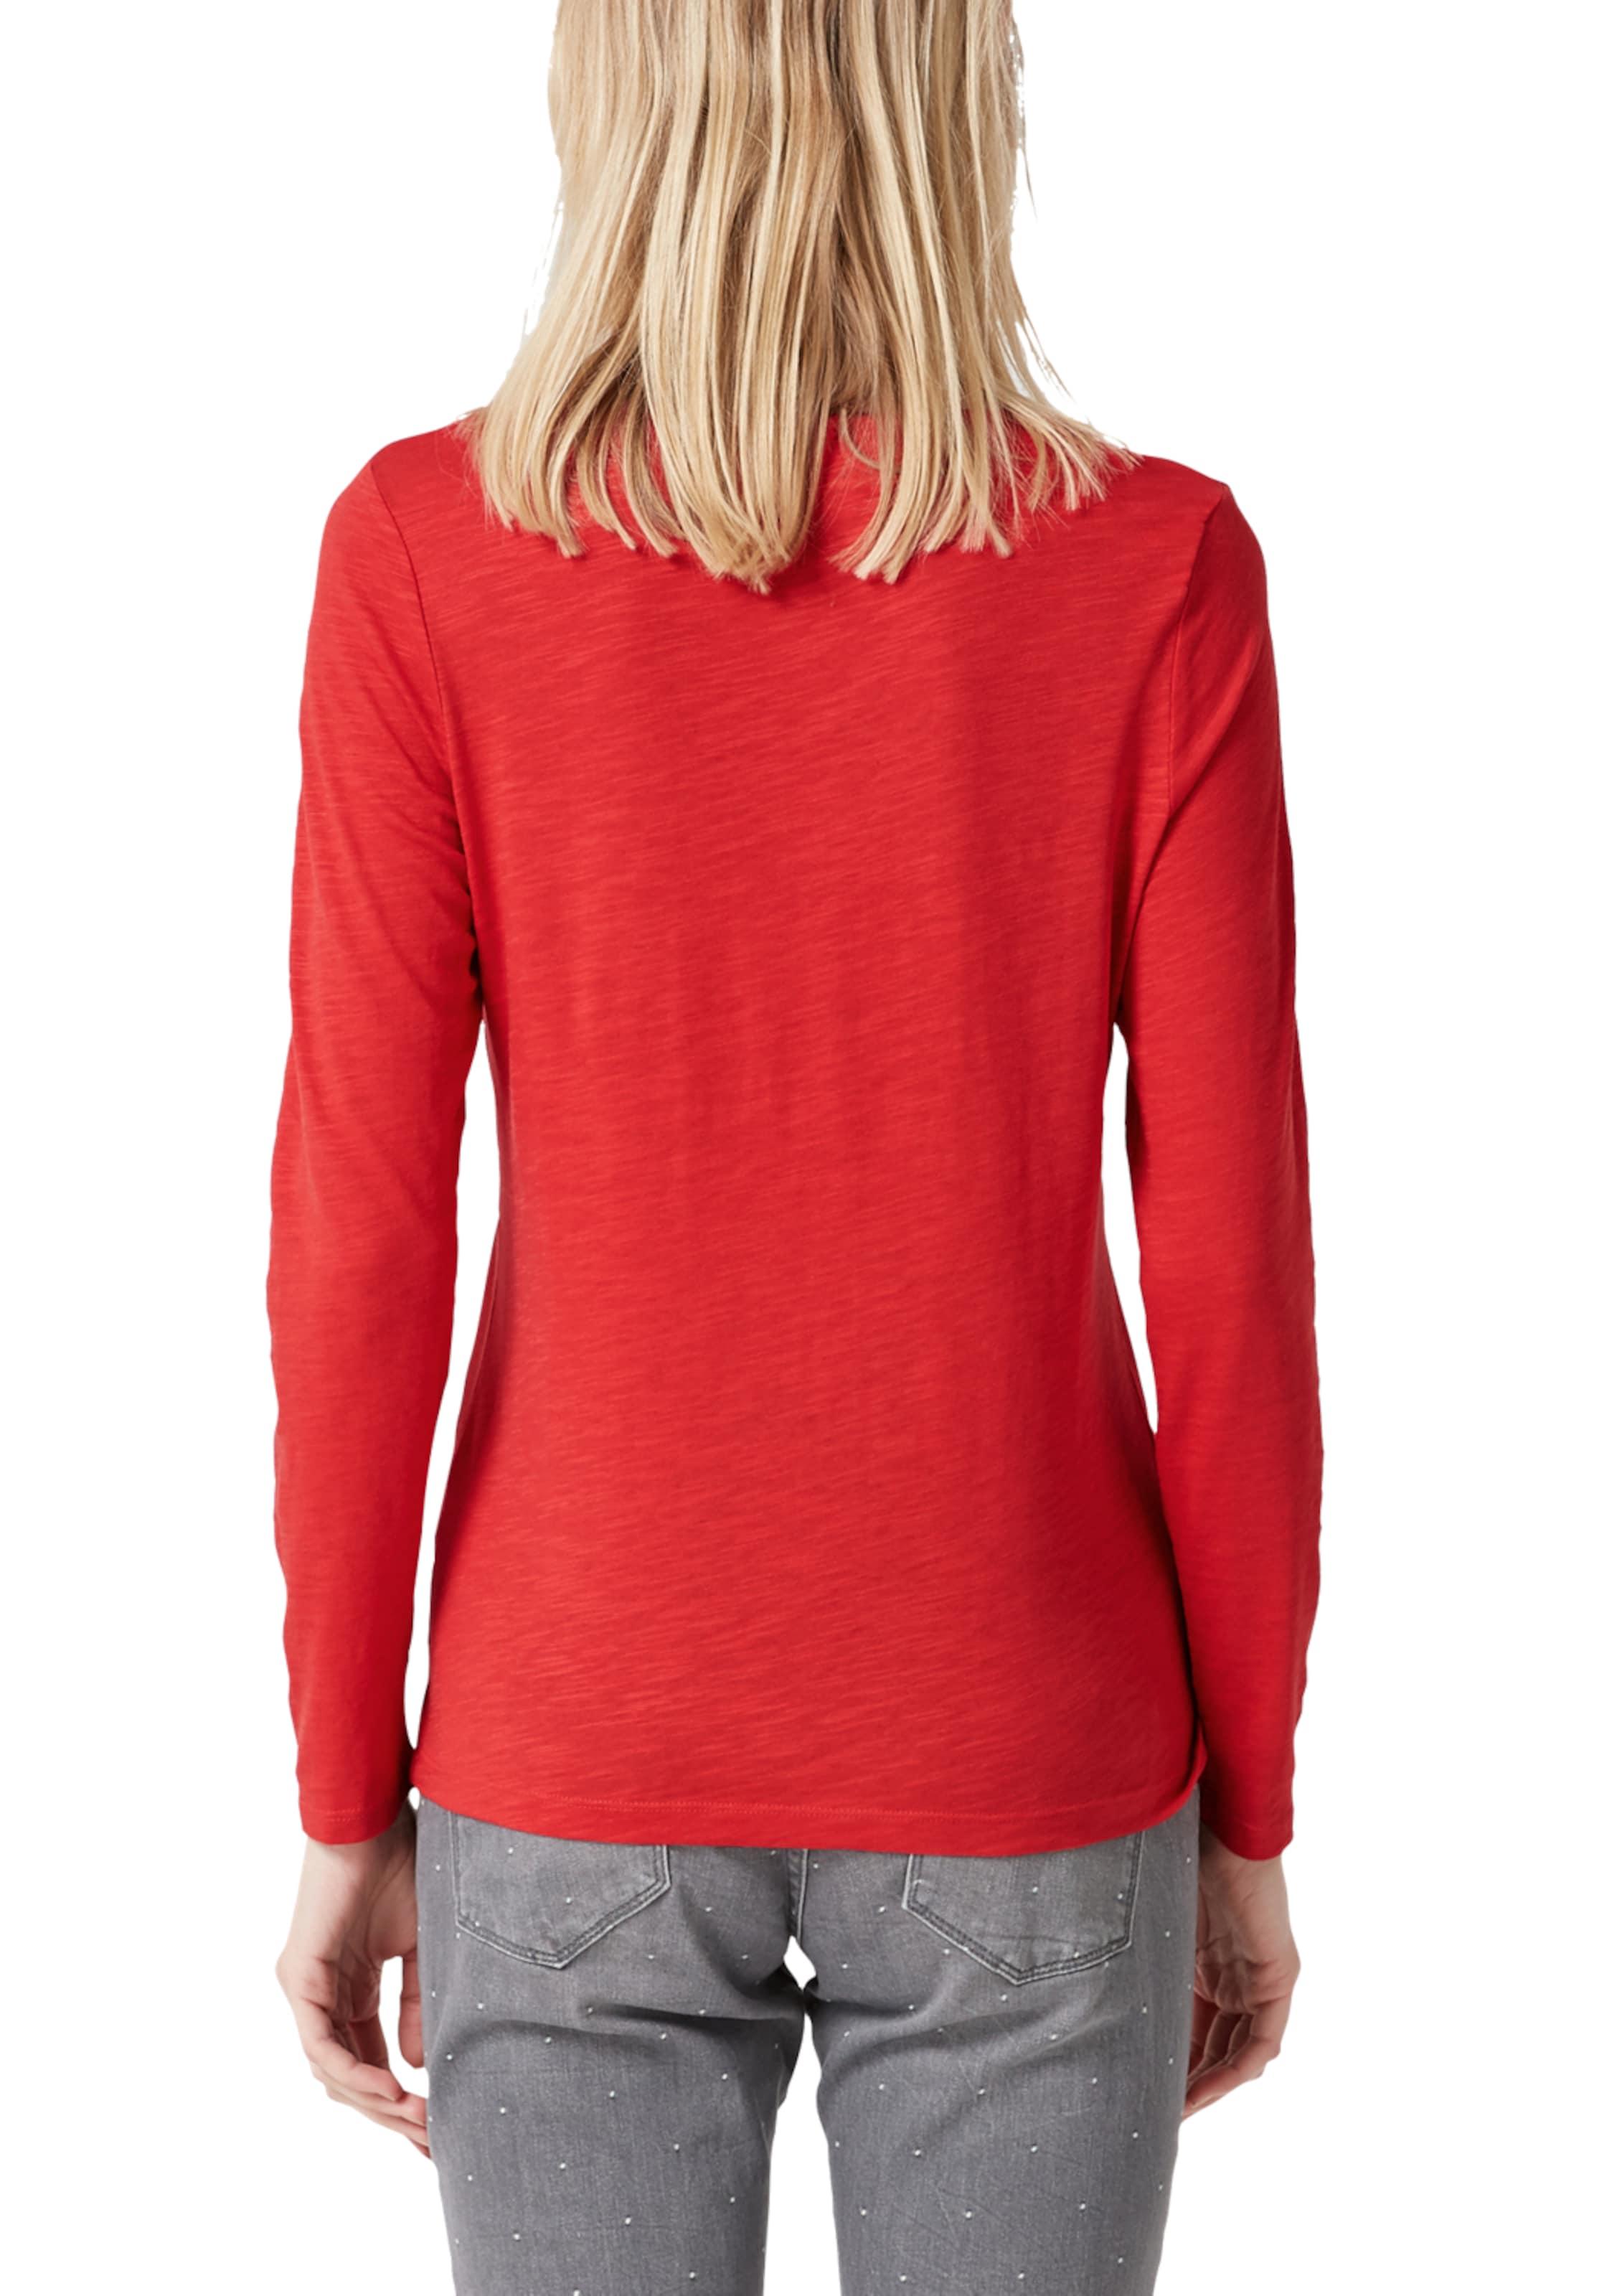 oliver Yarn' Label Shirt S Red 'slub In Hellrot SqUzMVp